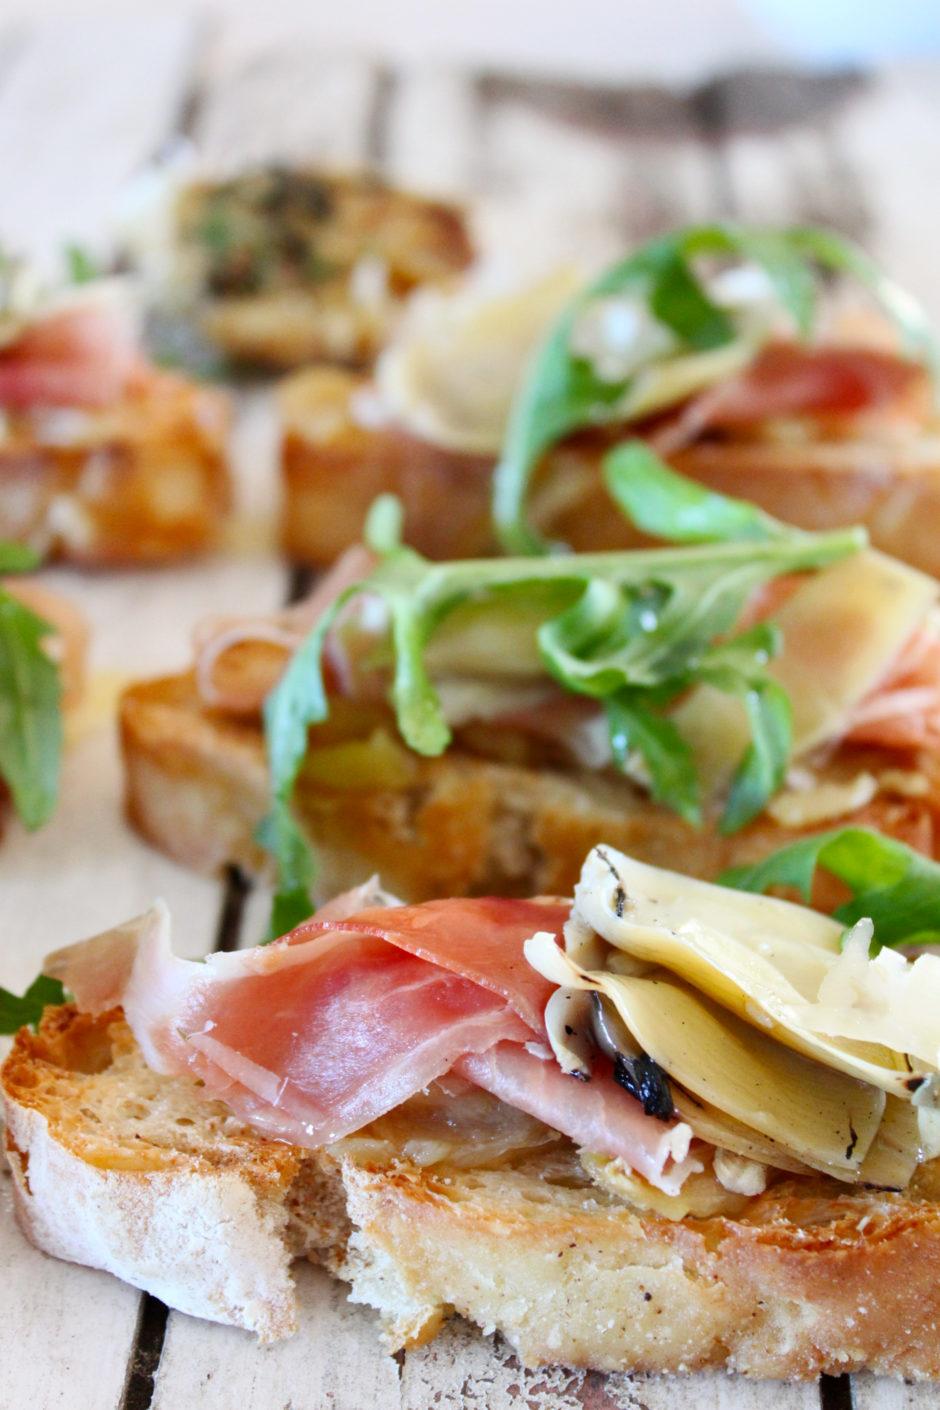 Bruschetta with Squashed Roasted Garlic, Marinated Artichokes and Parma Ham